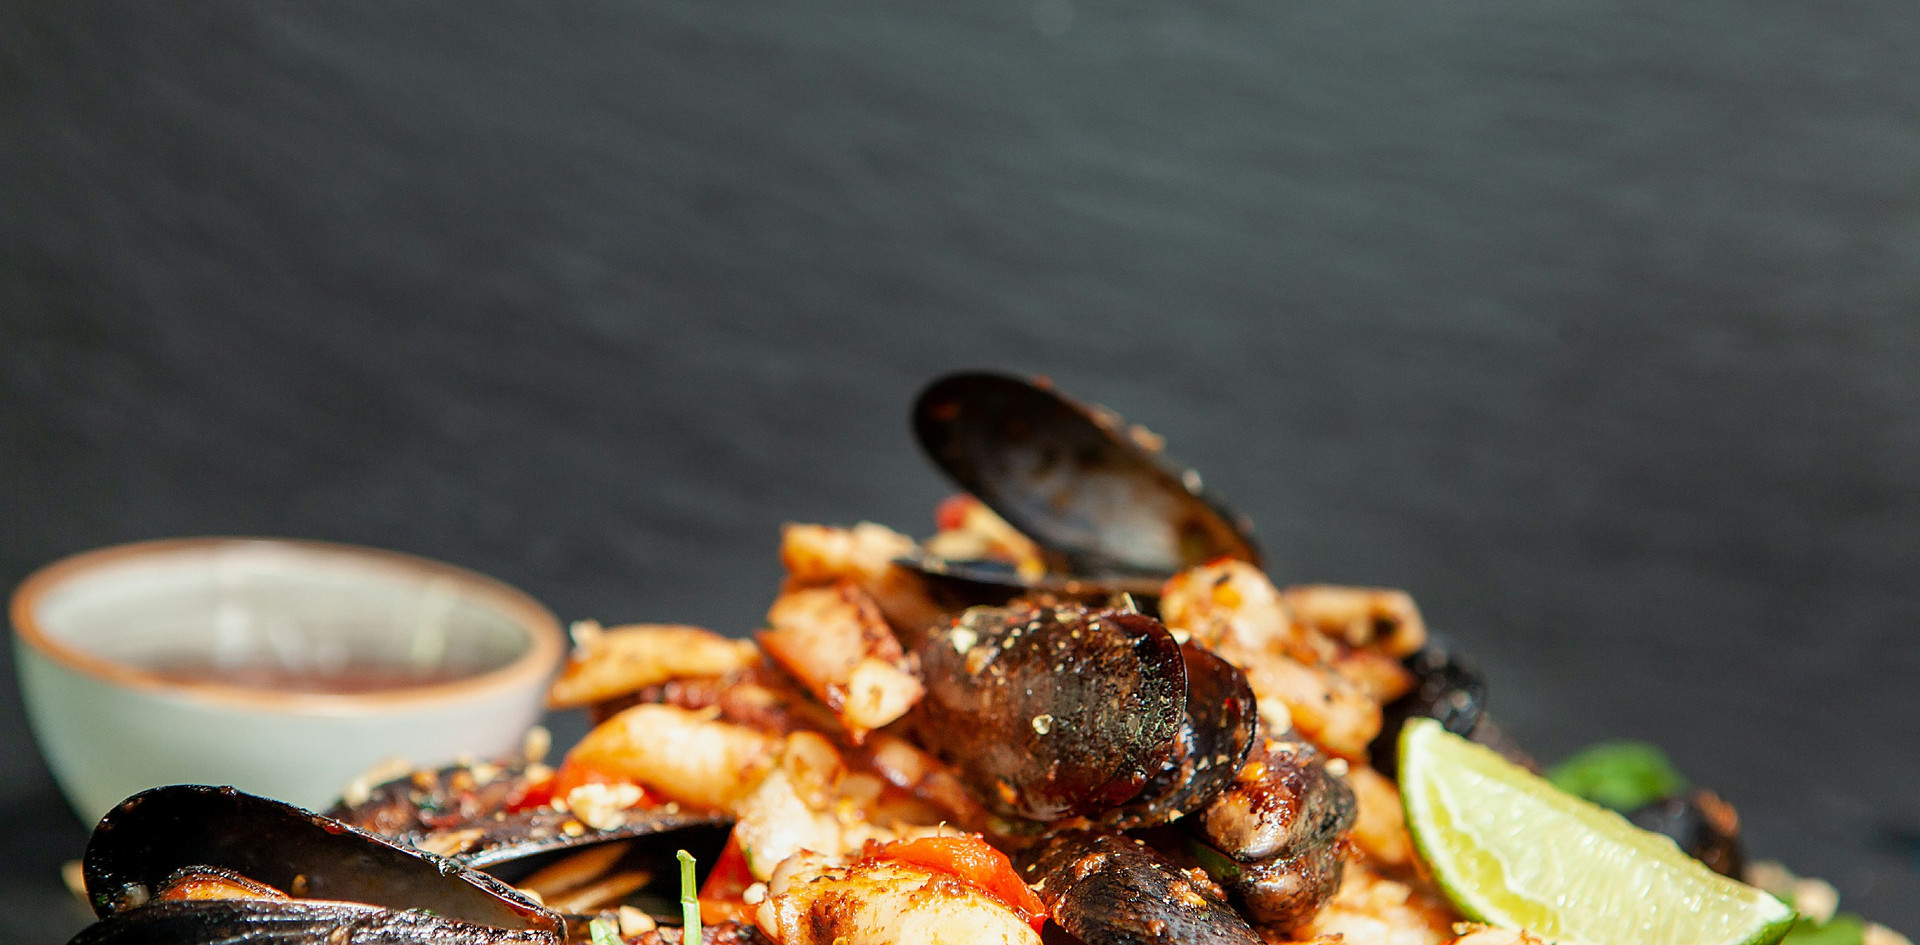 fine-cuisine-seafood-in-restaurant-ELR3H